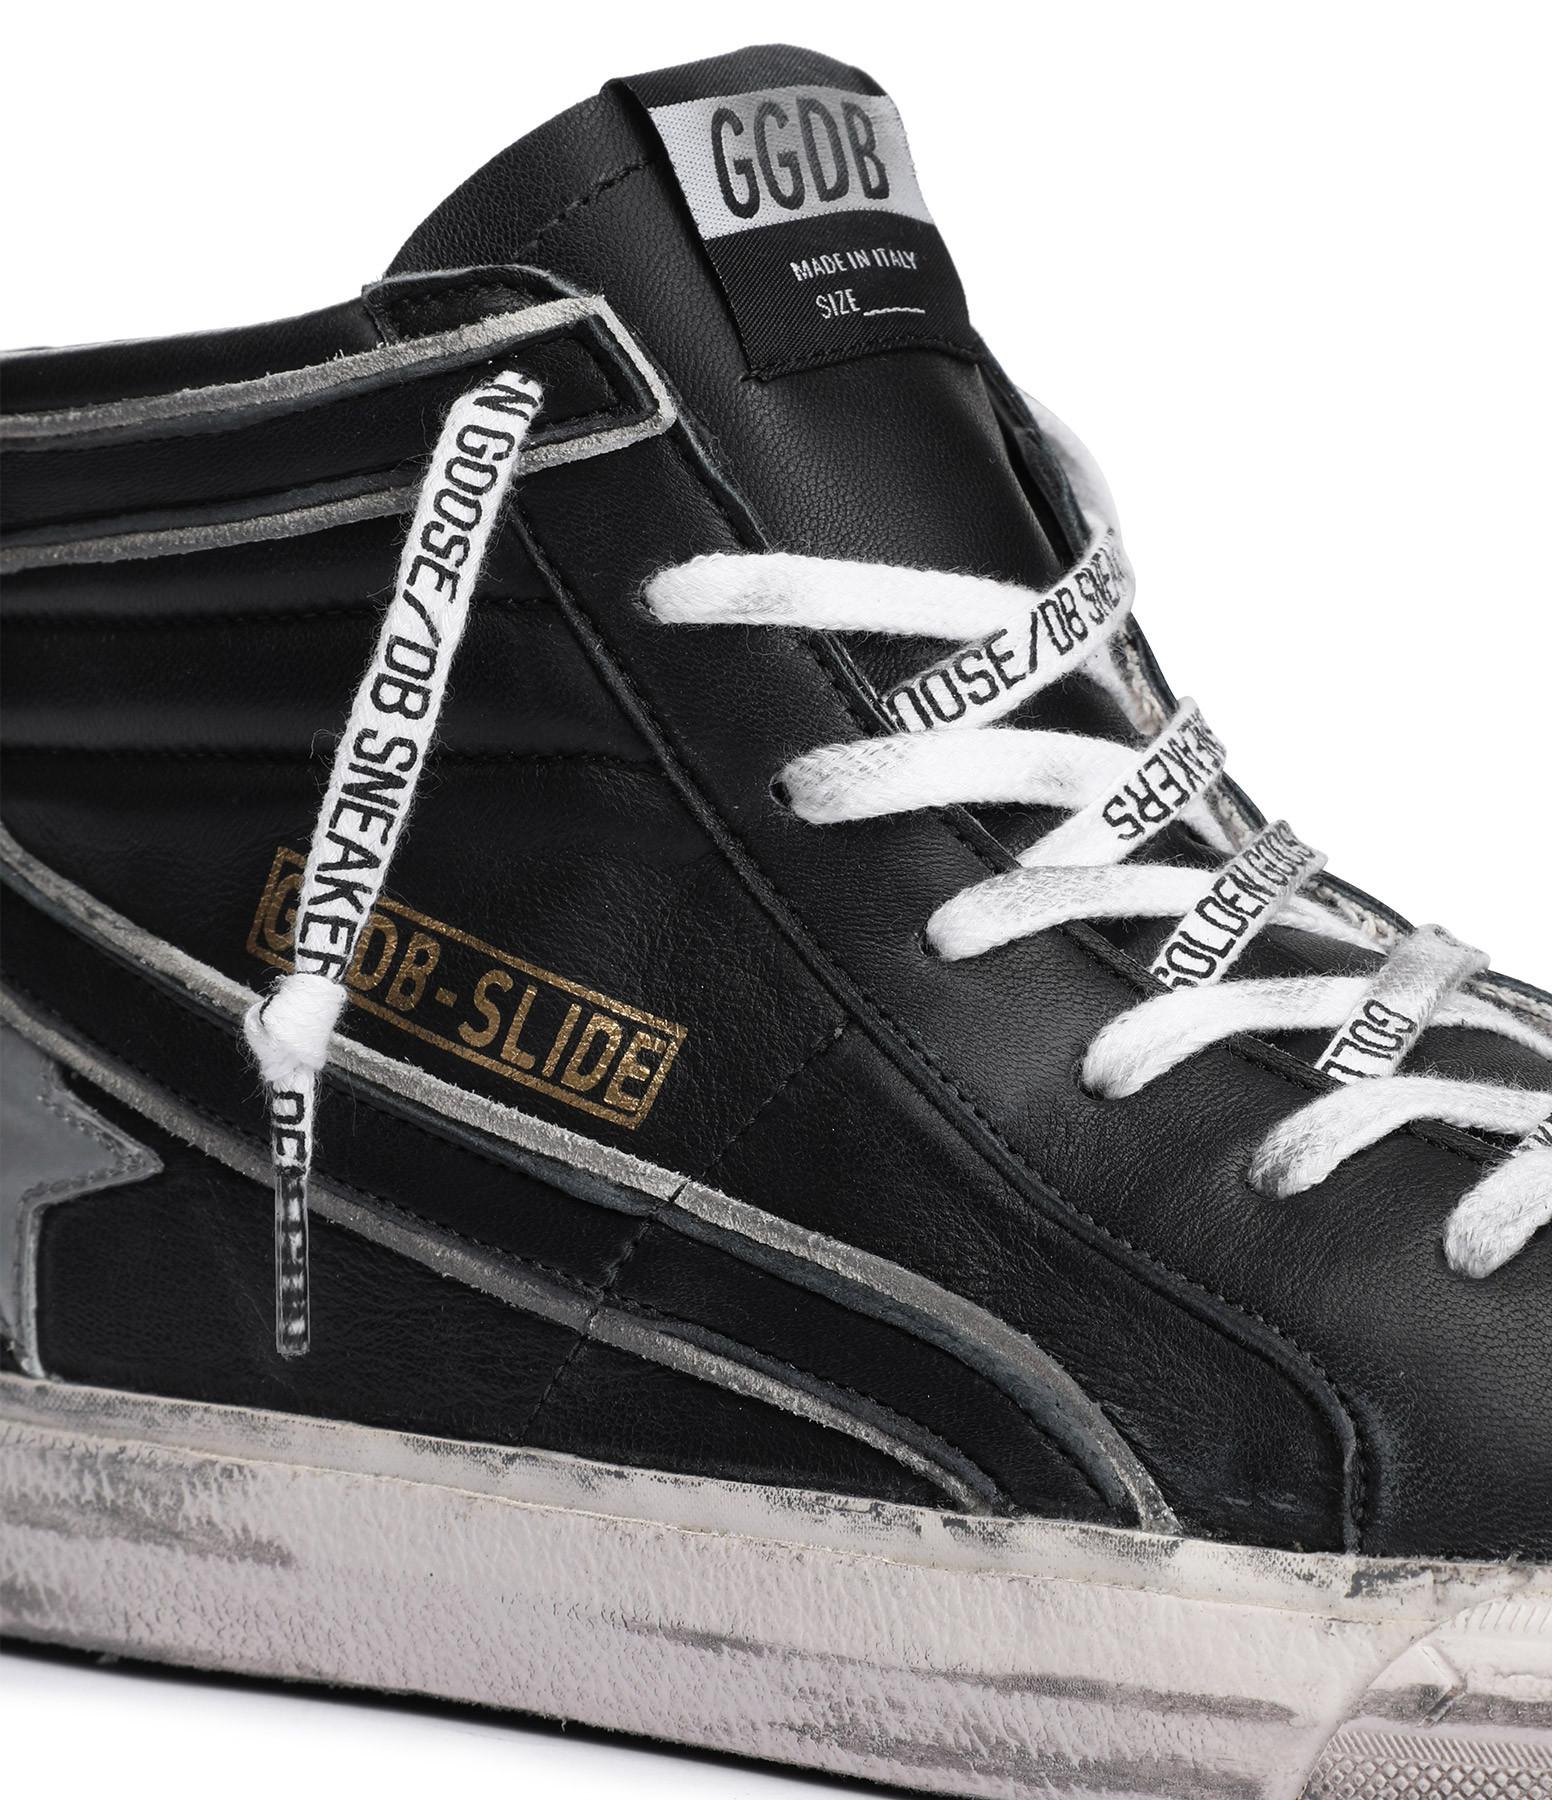 GOLDEN GOOSE - Baskets Homme Slide Cuir Noir Argenté